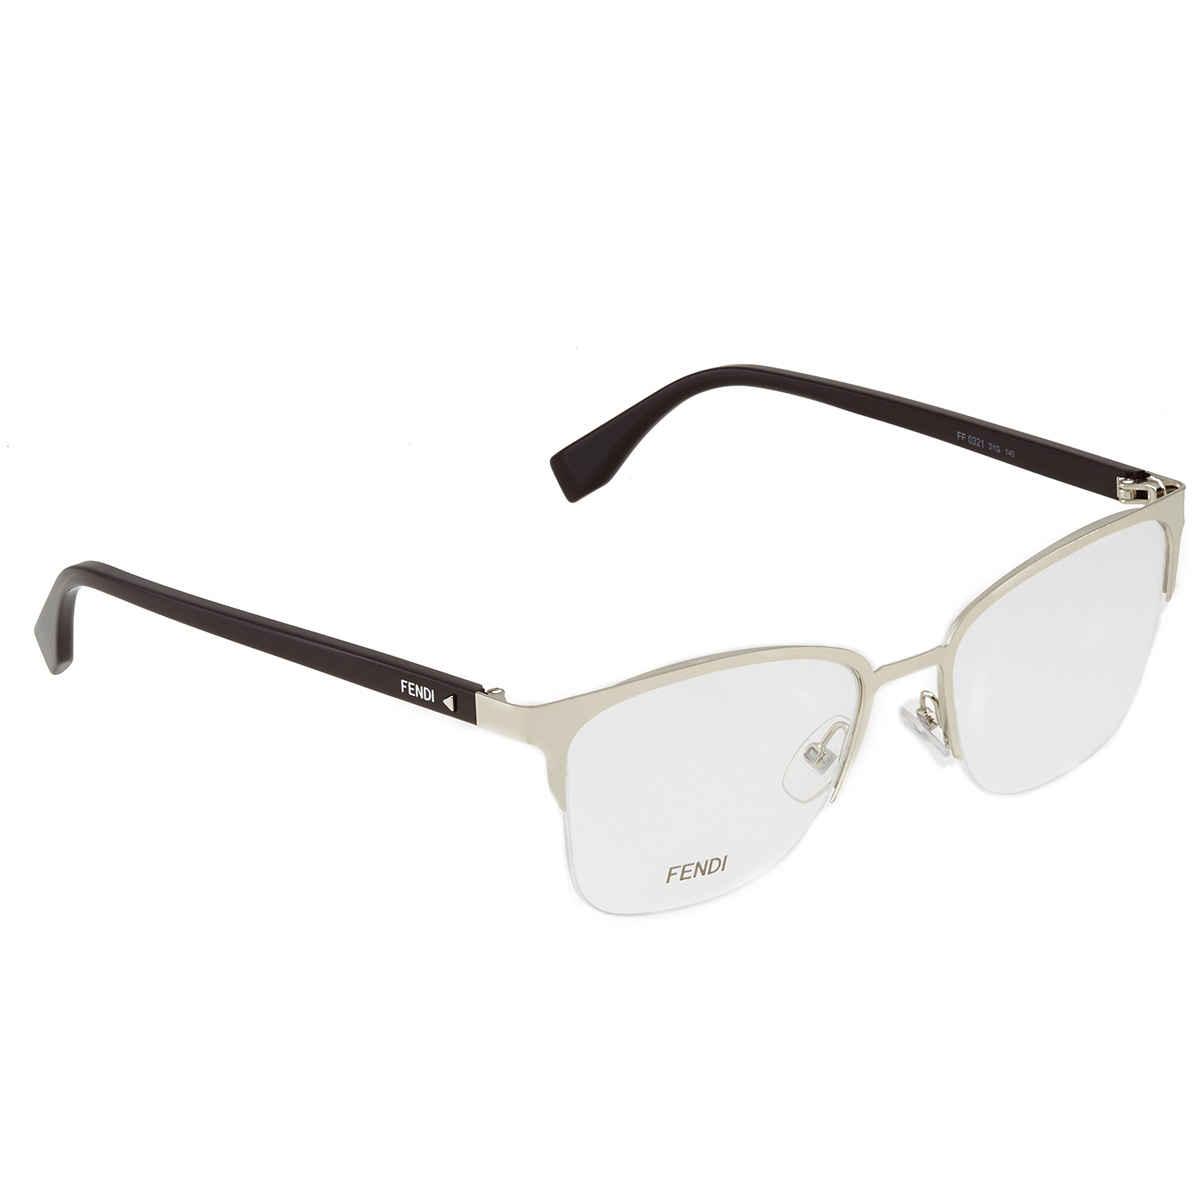 Fendi Demo Square Eyeglasses Ff0321 3yg 52 In Gold Tone